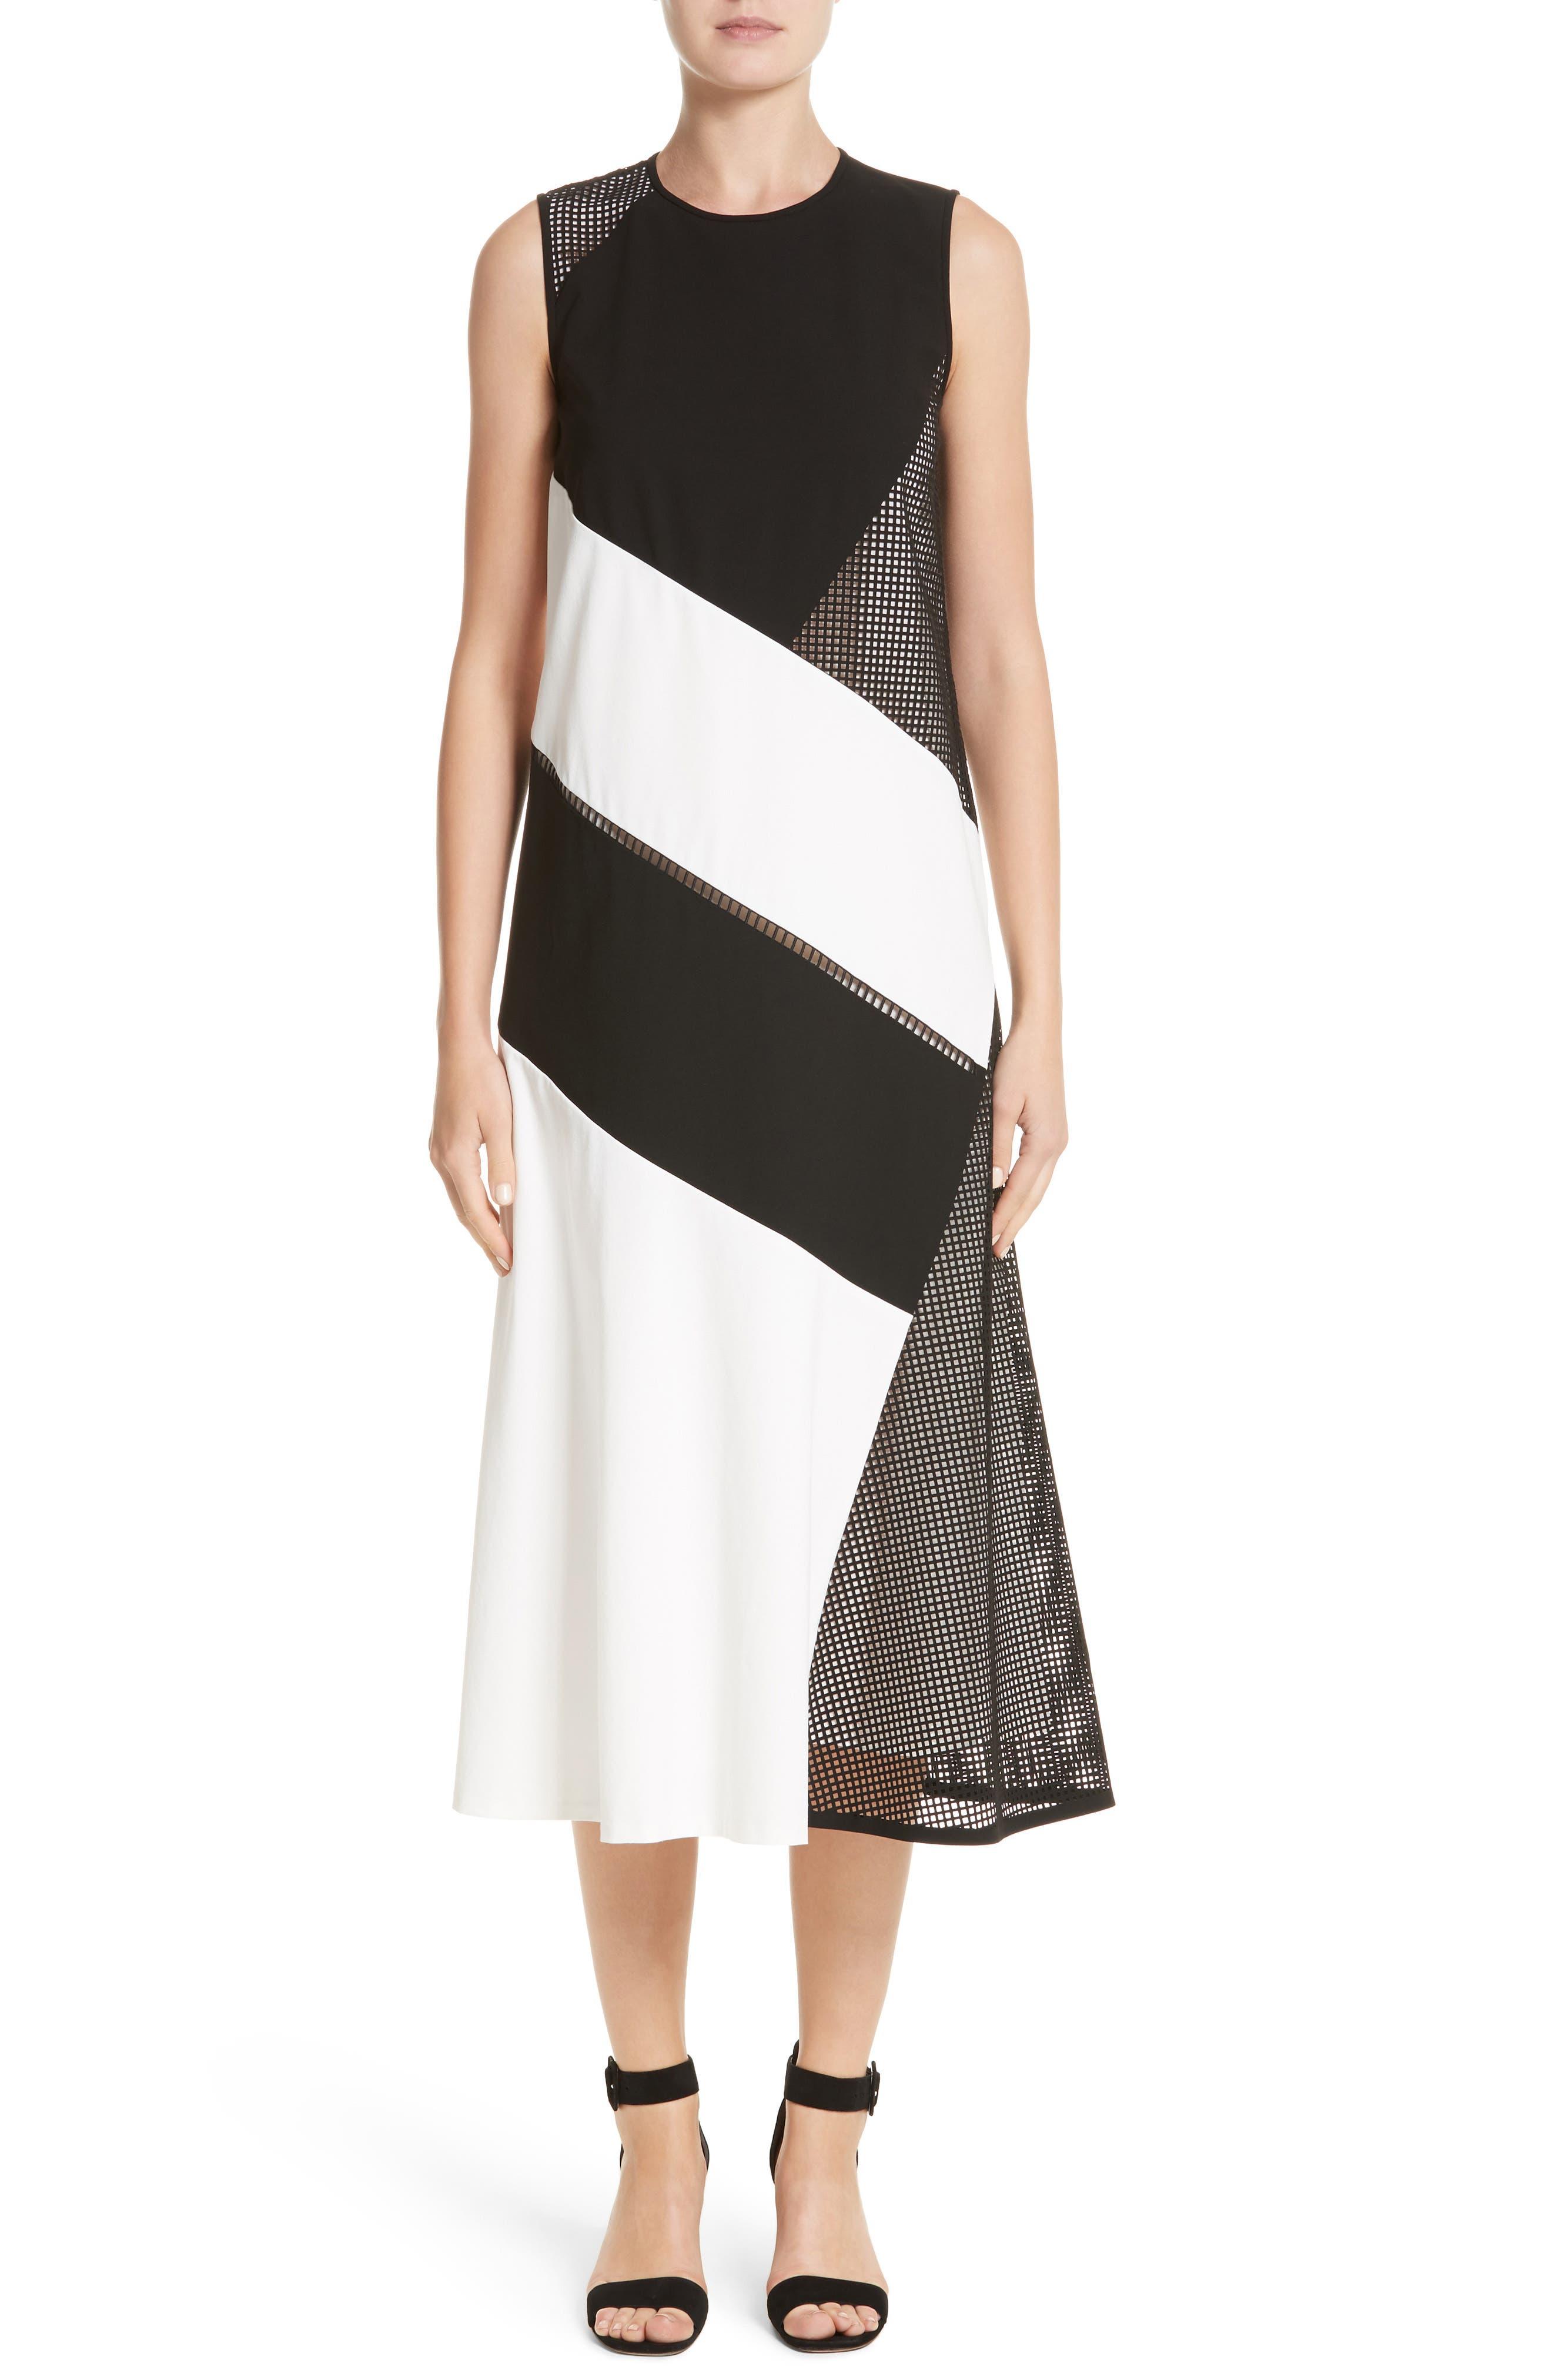 Nuri Laser Cut Midi Dress,                         Main,                         color, Black/Cloud